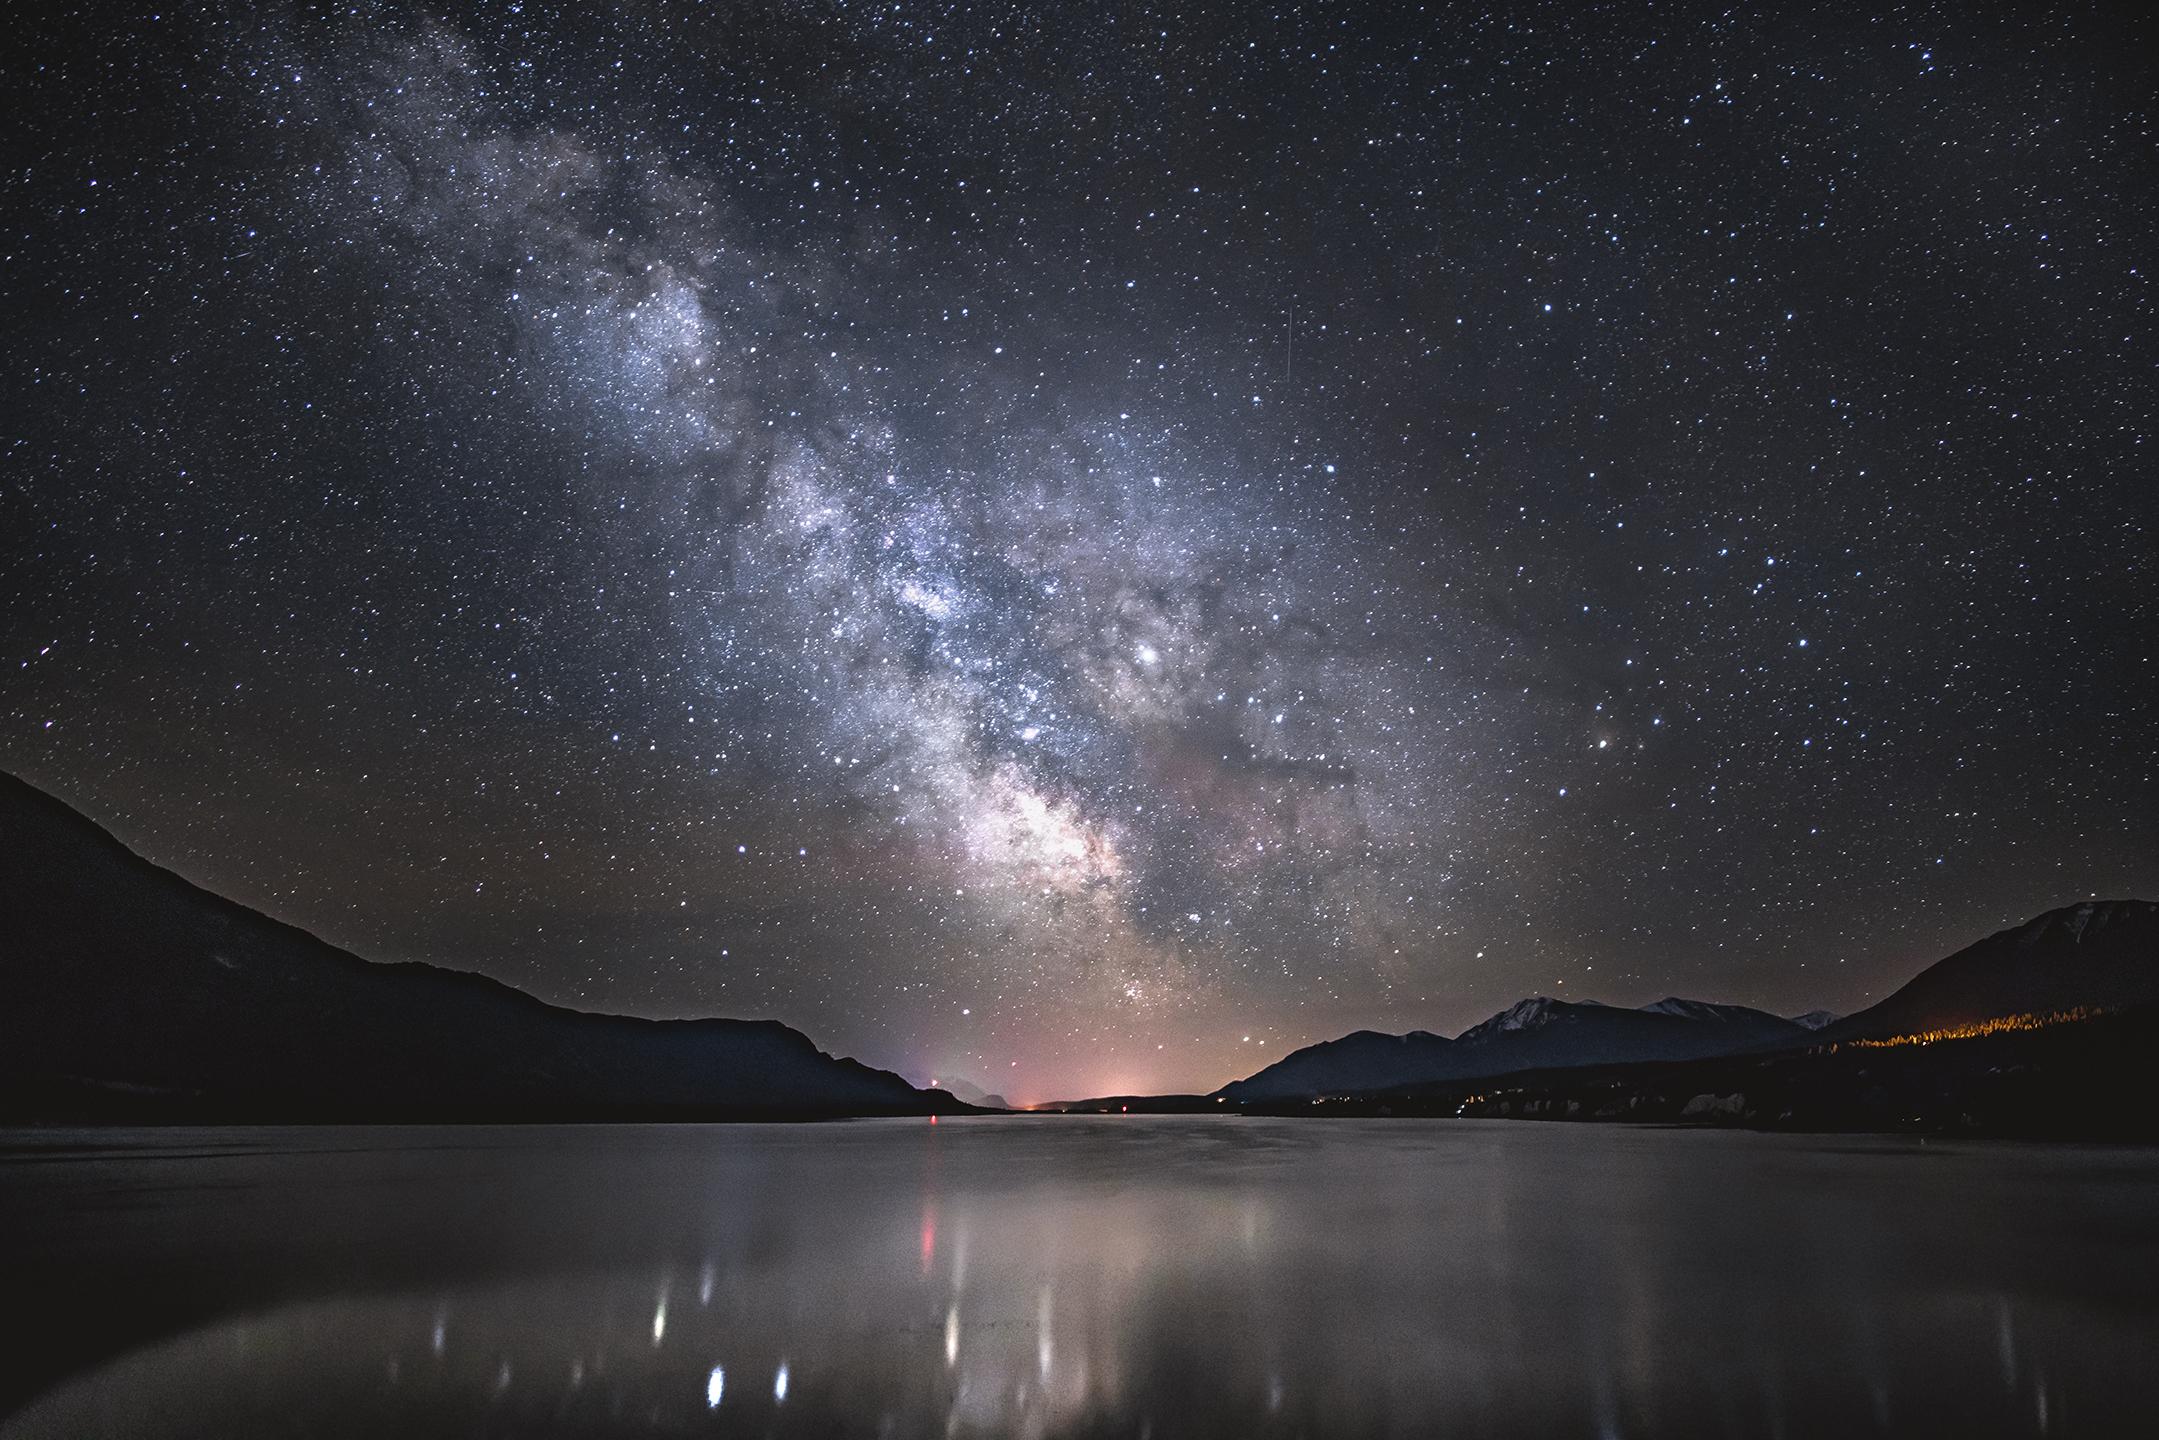 Colombia Lake - Columbia Lake, British Columbia, Canada // Photographer: Jason Wilson // Sony a7R II + Rokinon 24mm f/1.4 // ISO 2000, f/1.4, 15